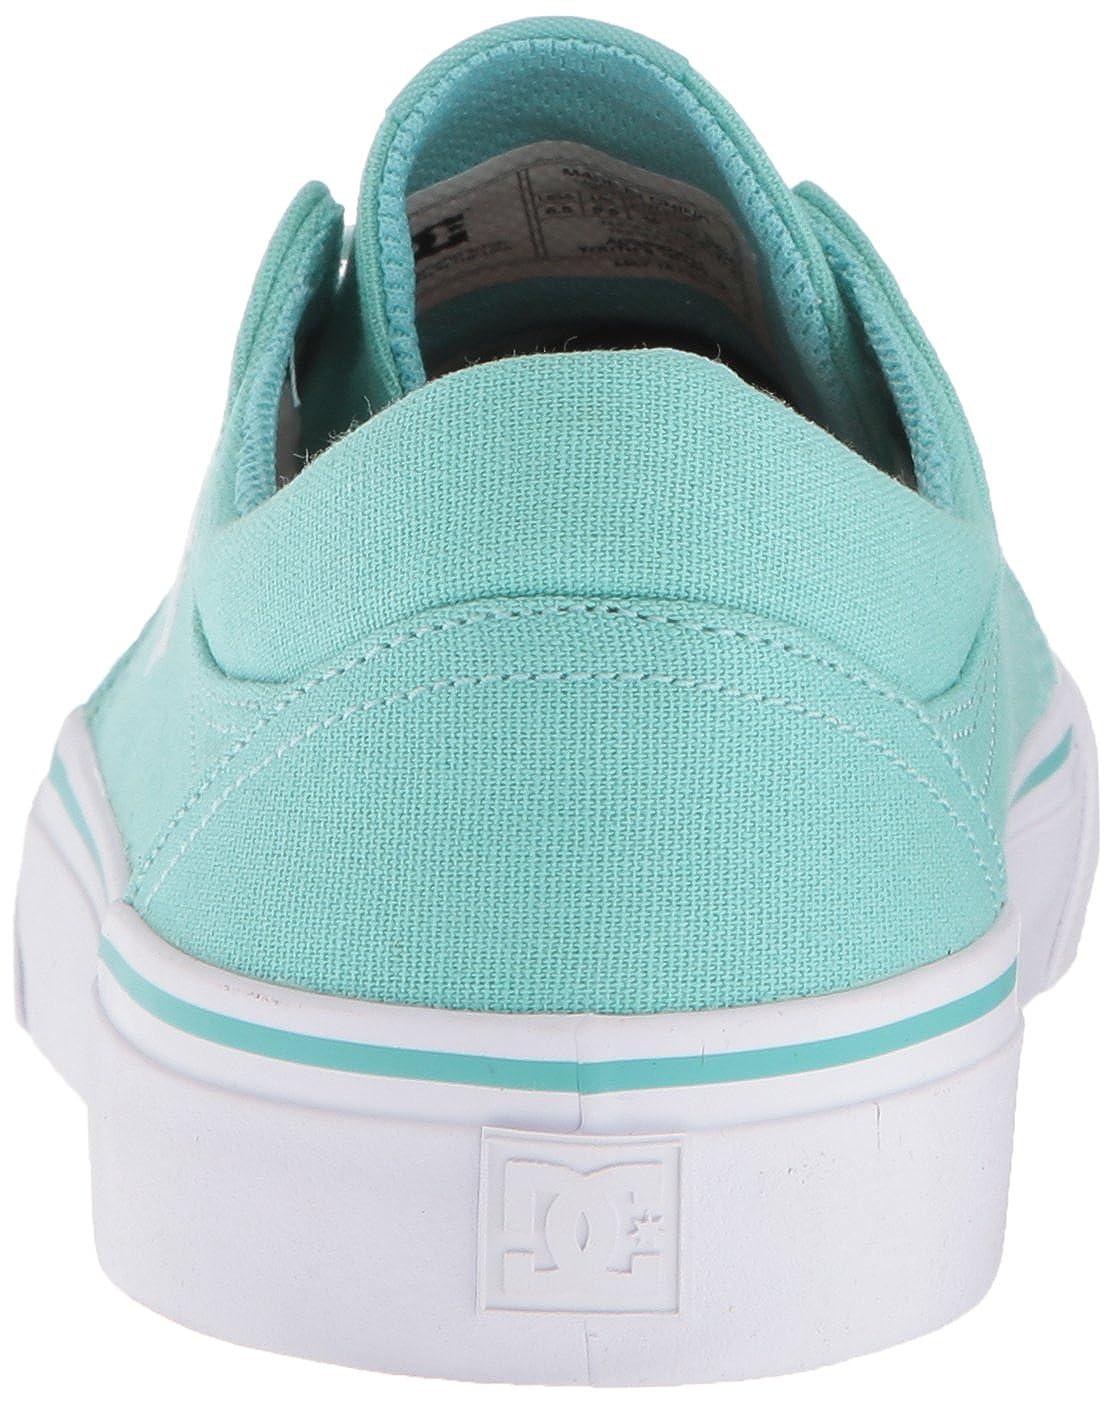 Dc Shoestonik Sneakers TxBasse shoes Uomo Amazon Rosa qMSzLUVpG